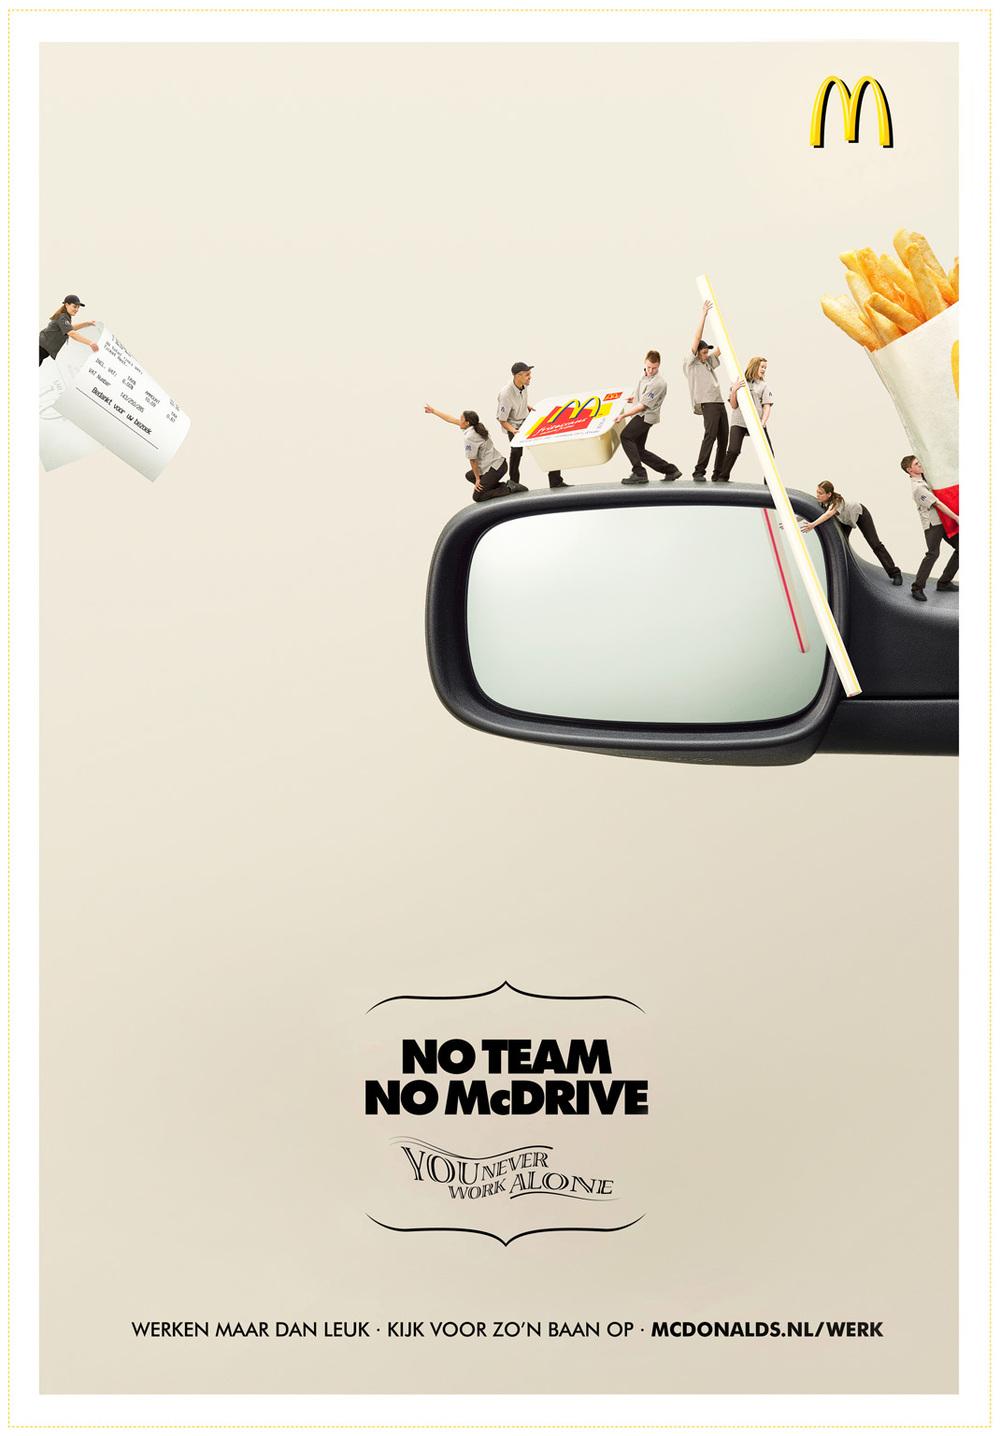 mcd_drive_ad.jpg